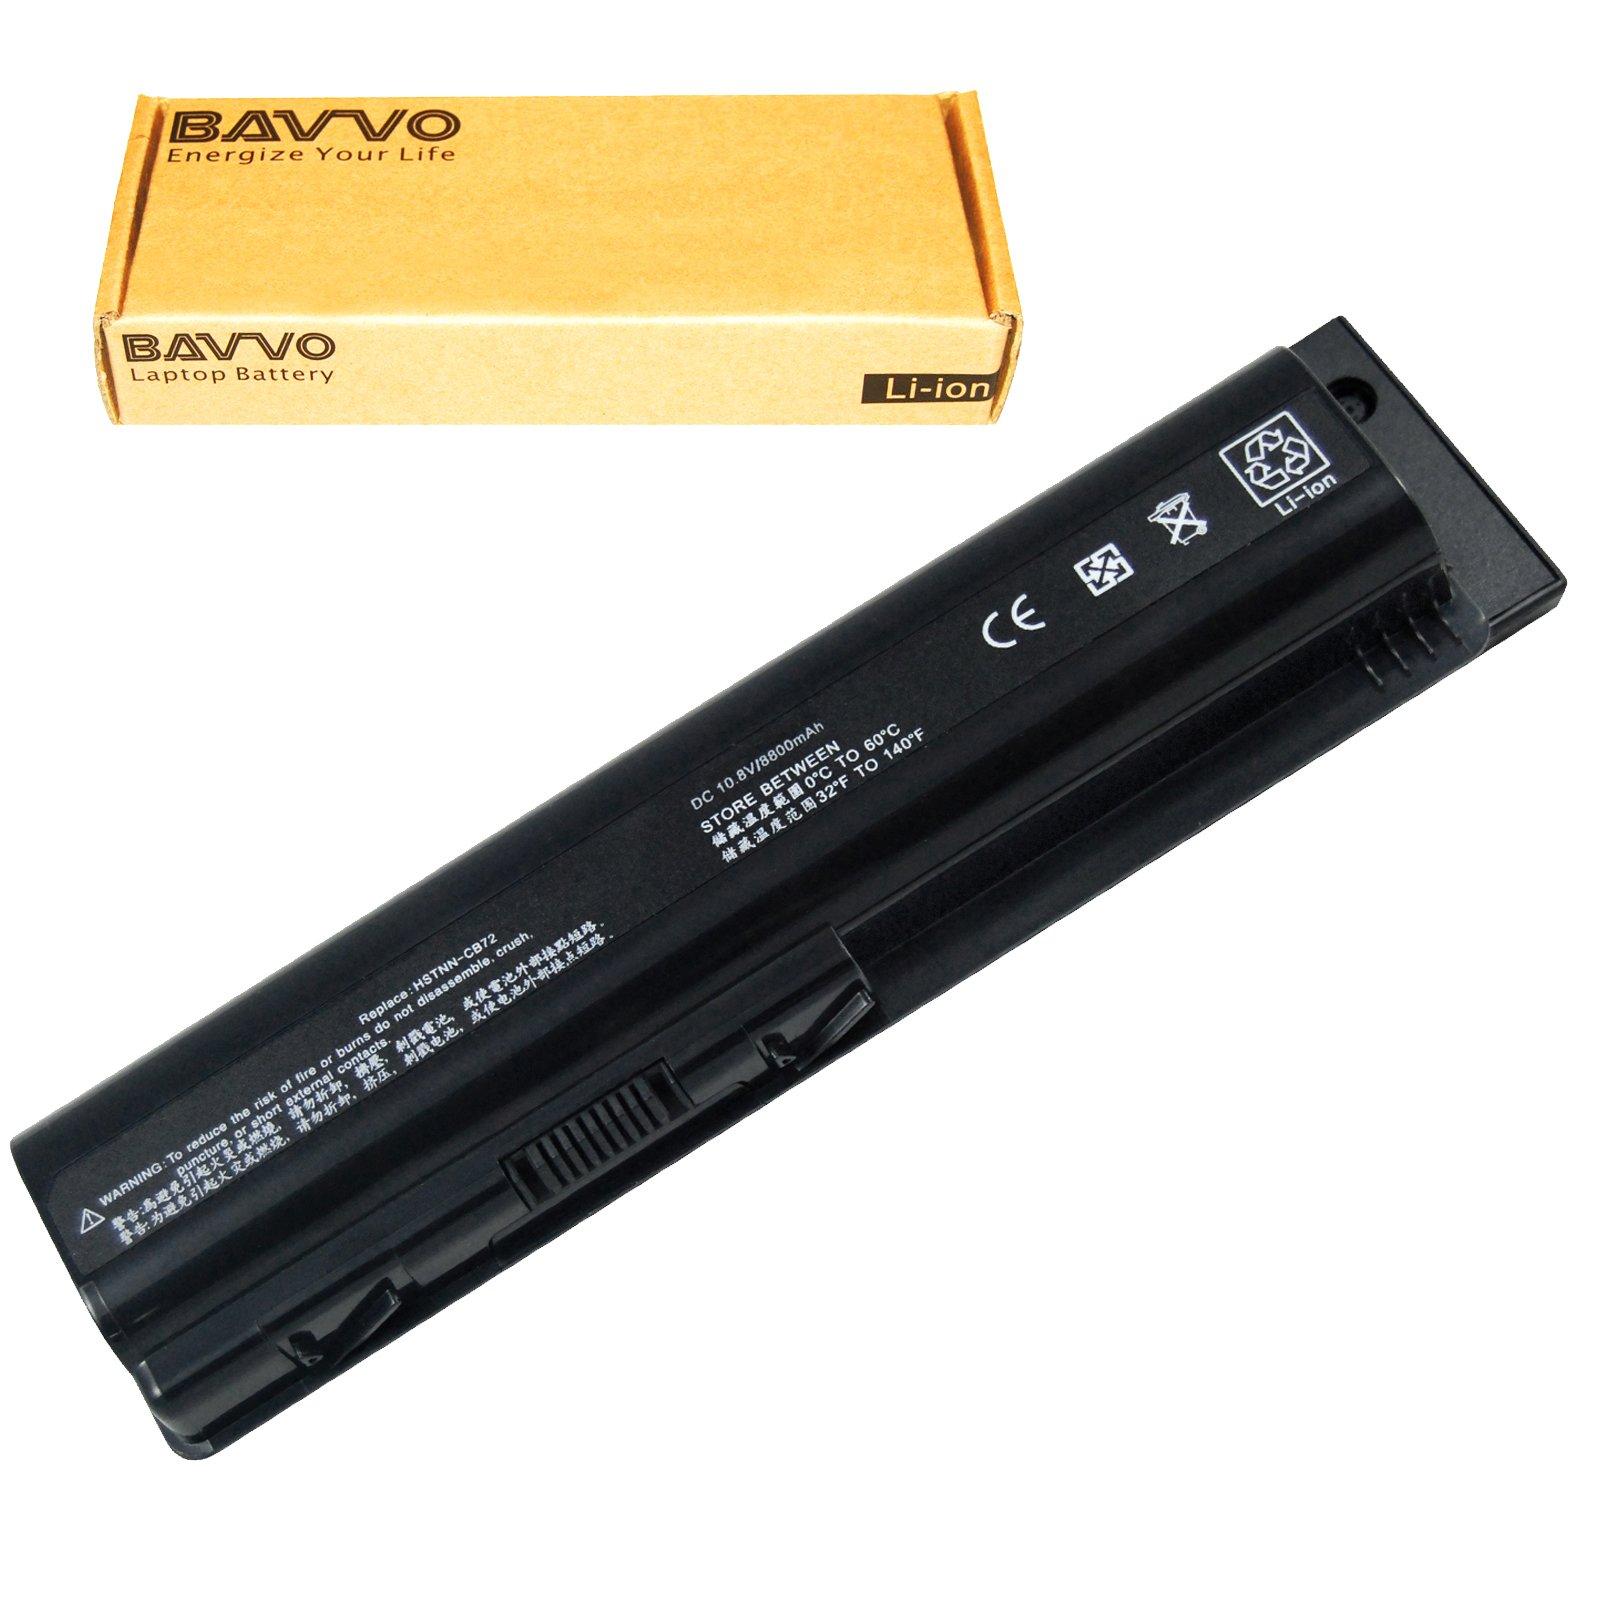 Bavvo 12-Cell Battery Compatible with Pavilion Dv6-1337Tx DV6-1338CA Dv6-1350Us DV6-1351NR